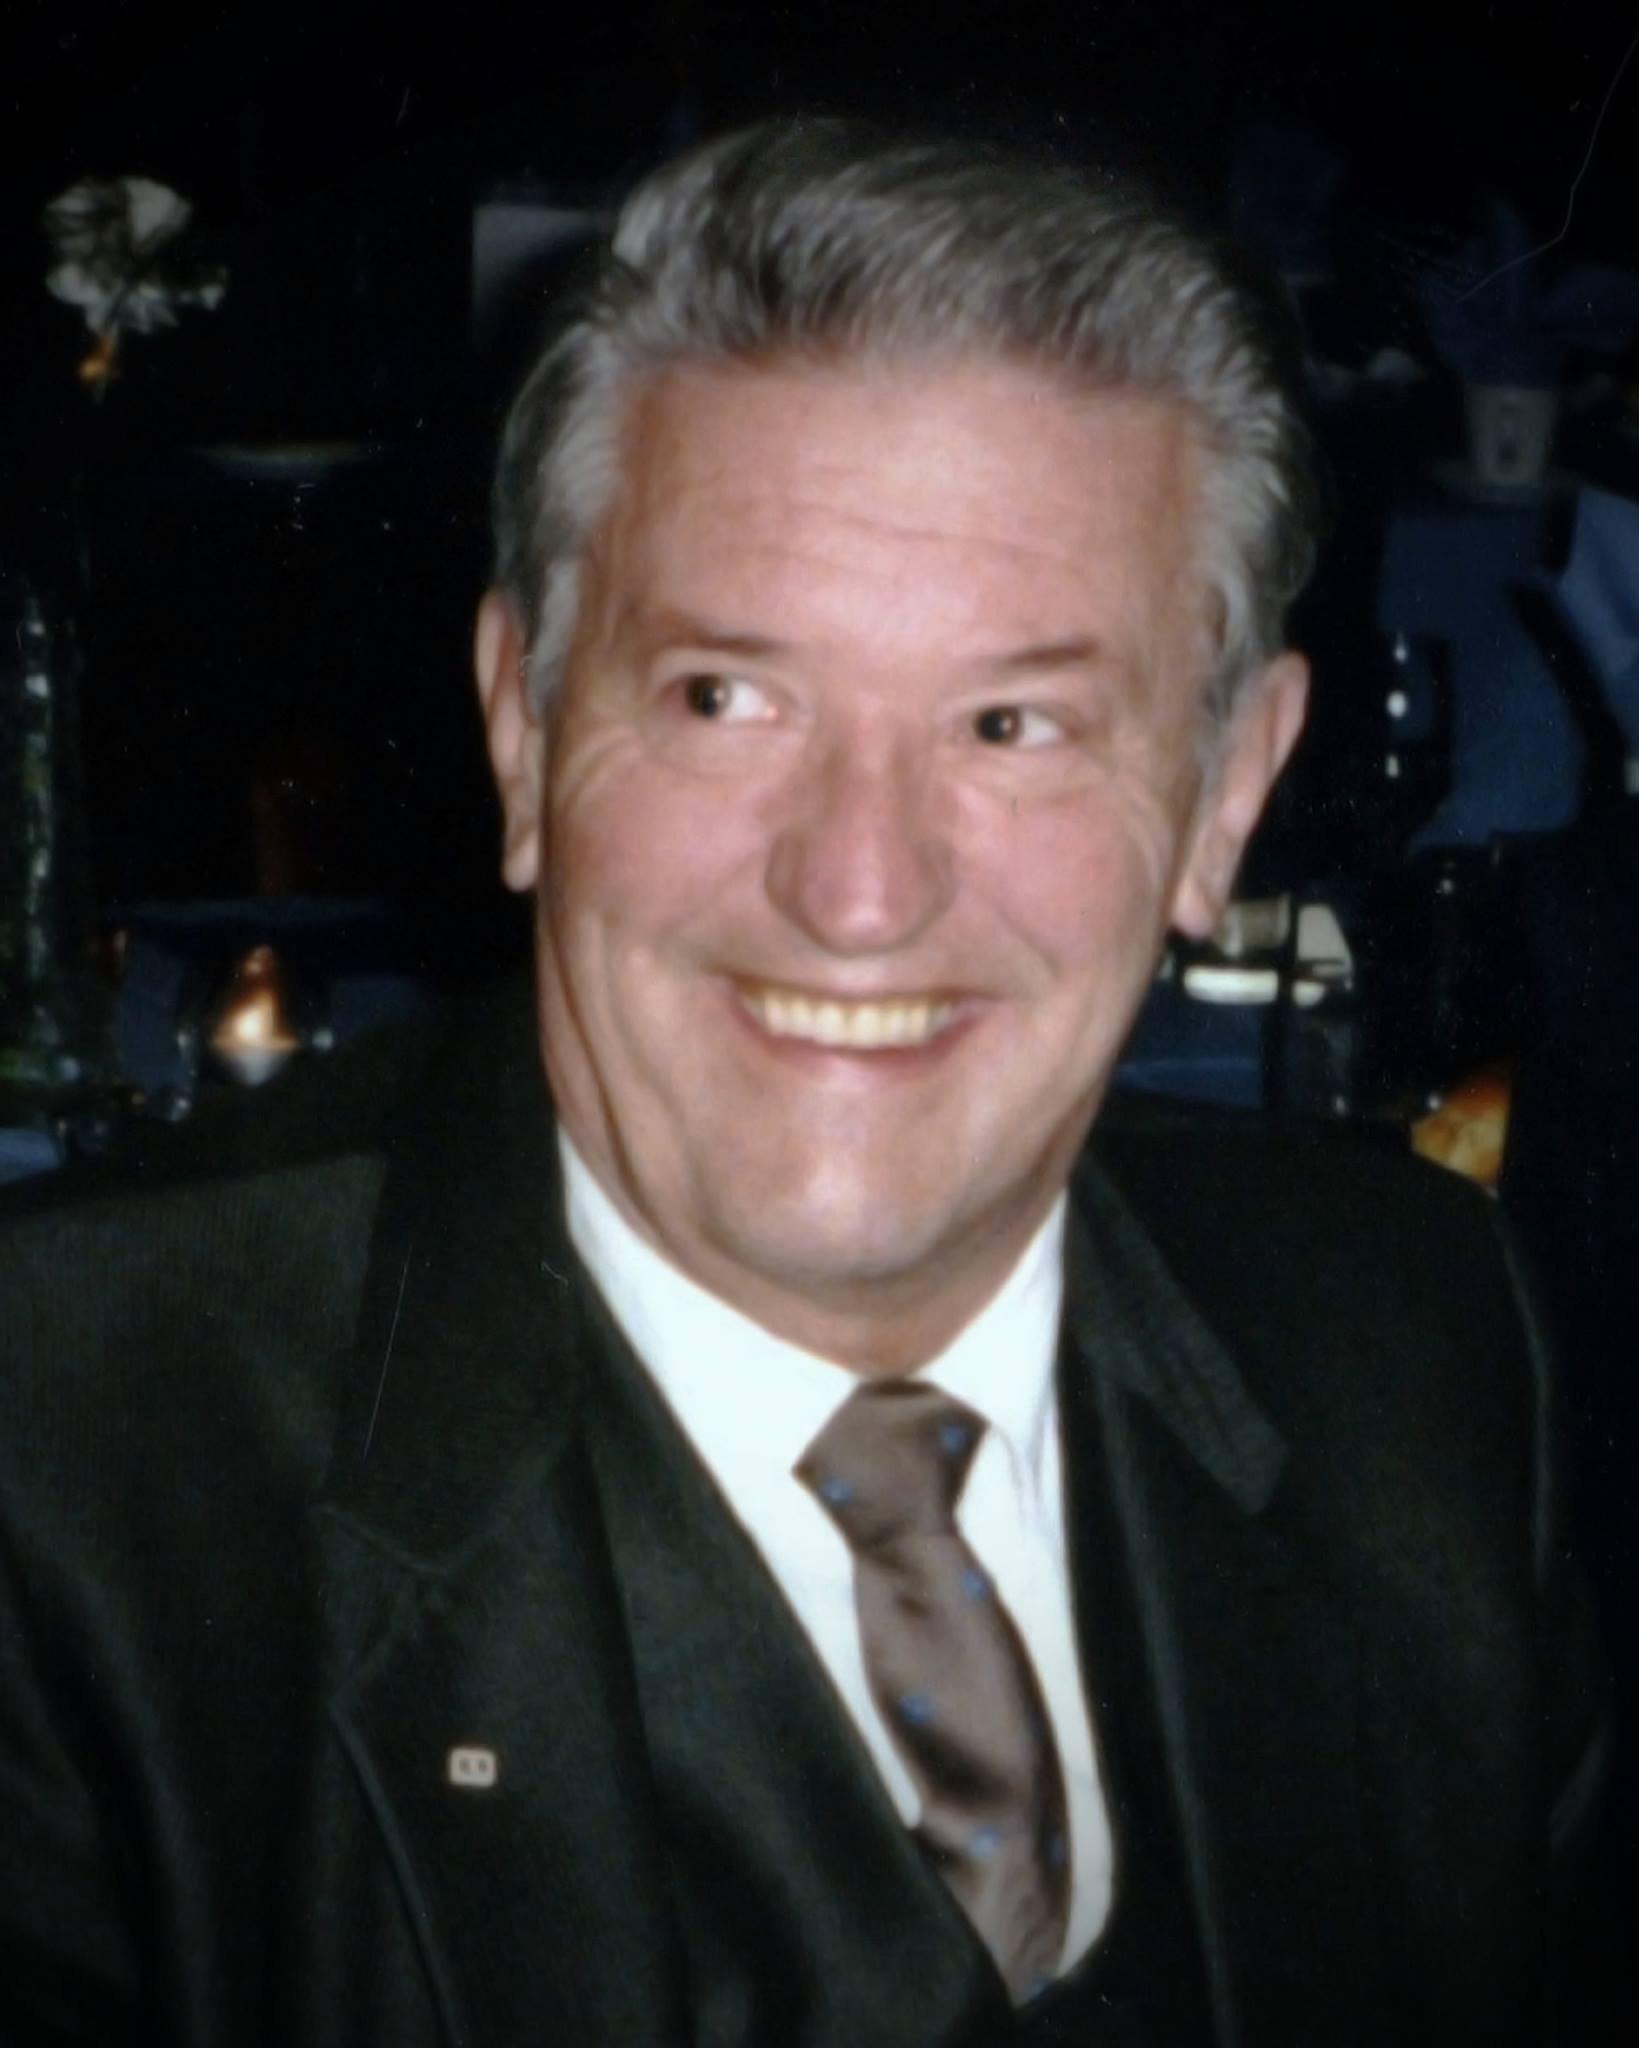 David R. Kincaid